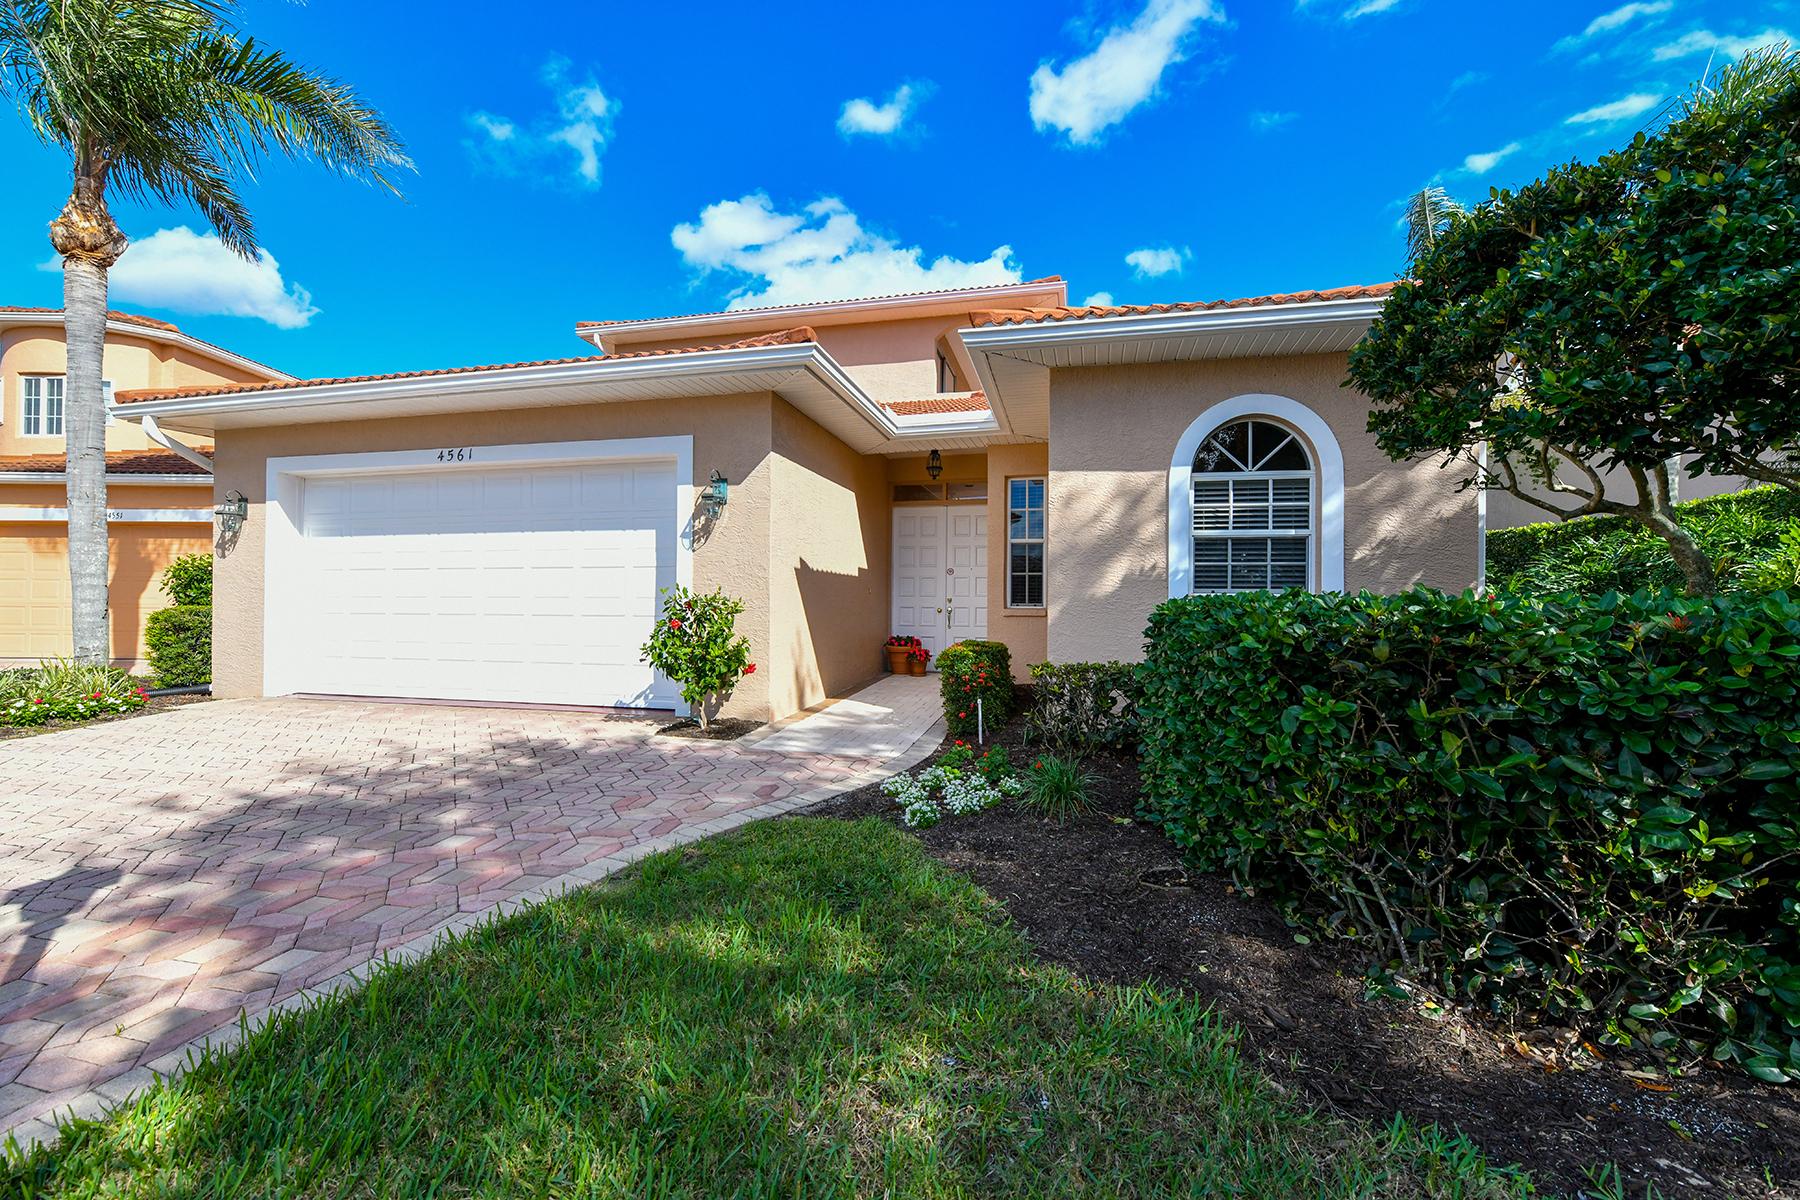 Single Family Home for Sale at PRESTANCIA 4561 Murcia Blvd 13, Sarasota, Florida 34238 United States